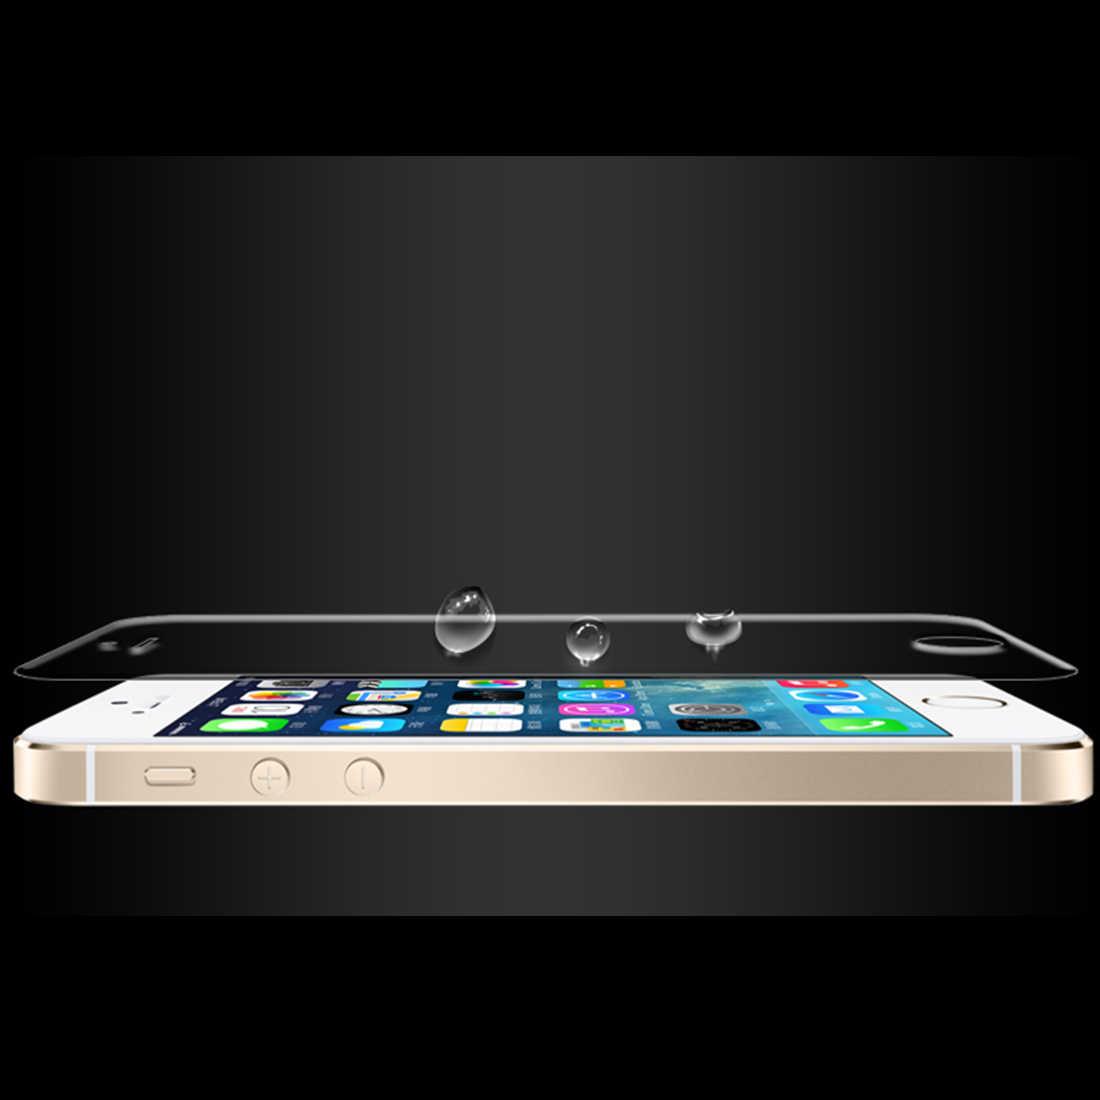 Elenxs انفجار-برهان واضح حارس الشاشة شفافة واقية نانو الانفجار واقية فيلم ل iPhone5 5s 5c 6 /زائد 6 s/زائد